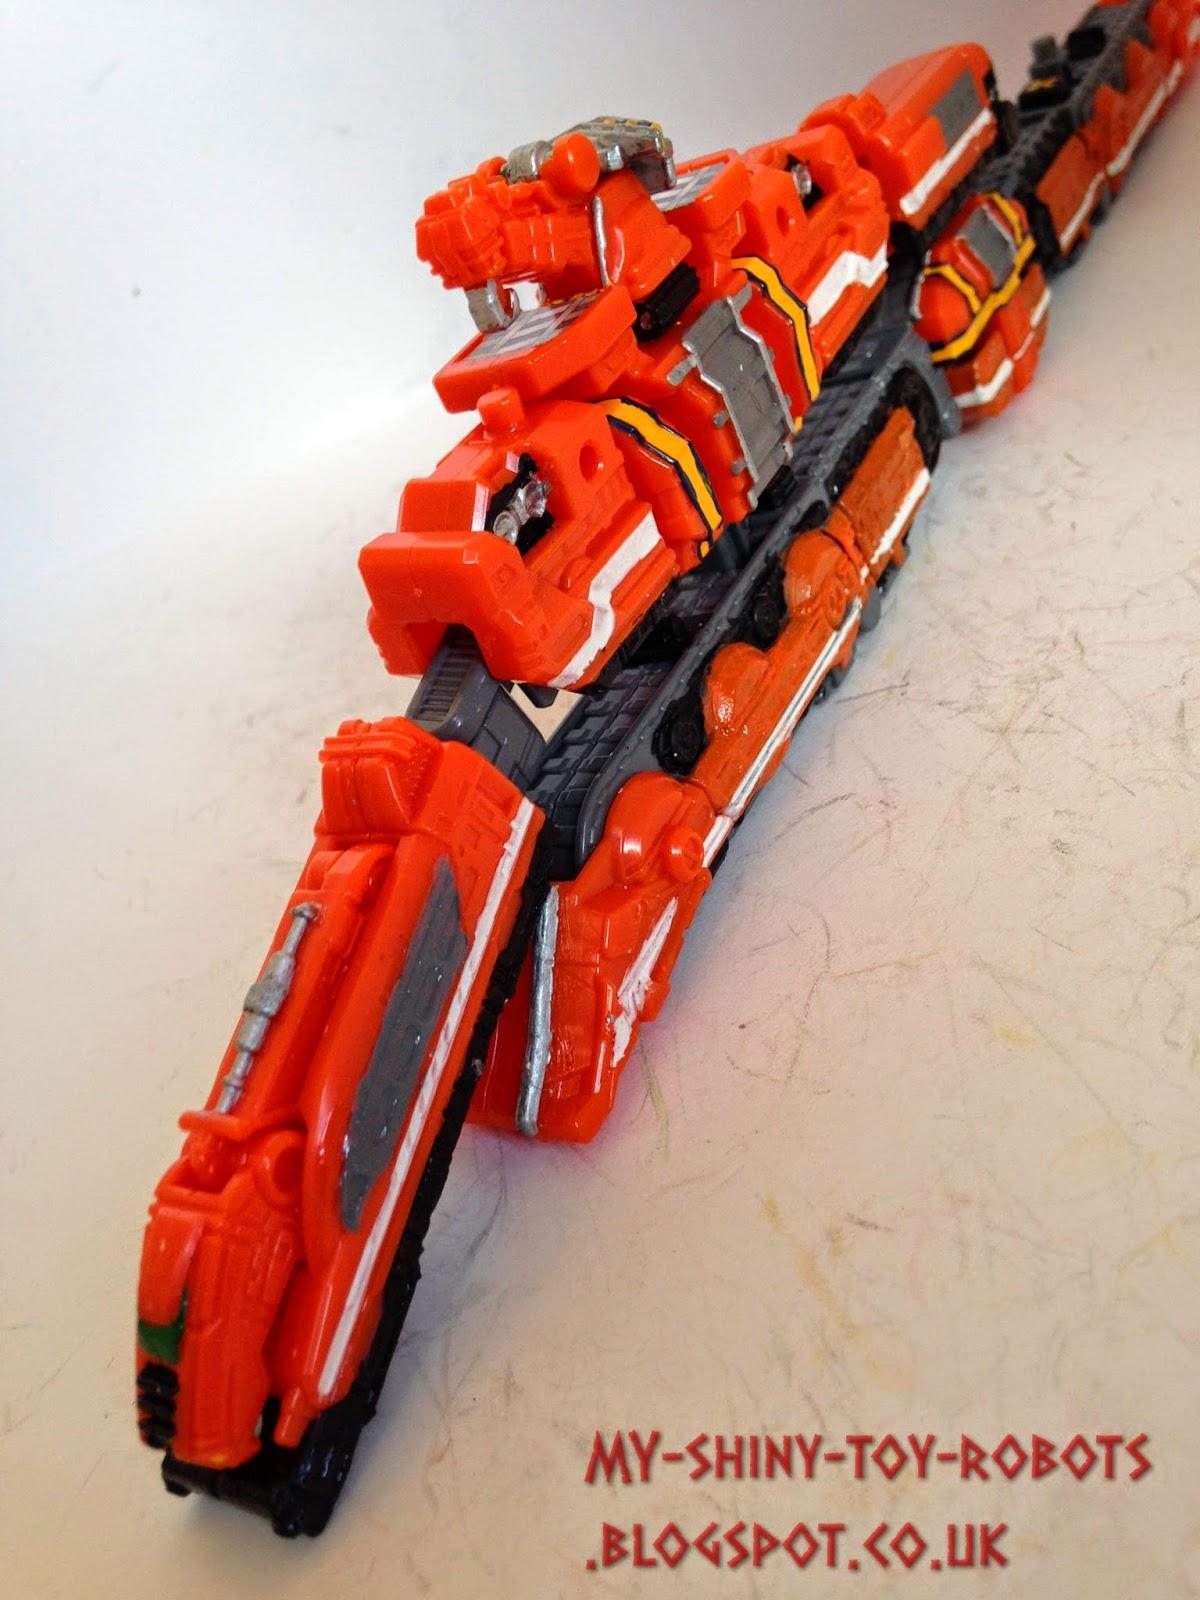 Splitting the trains